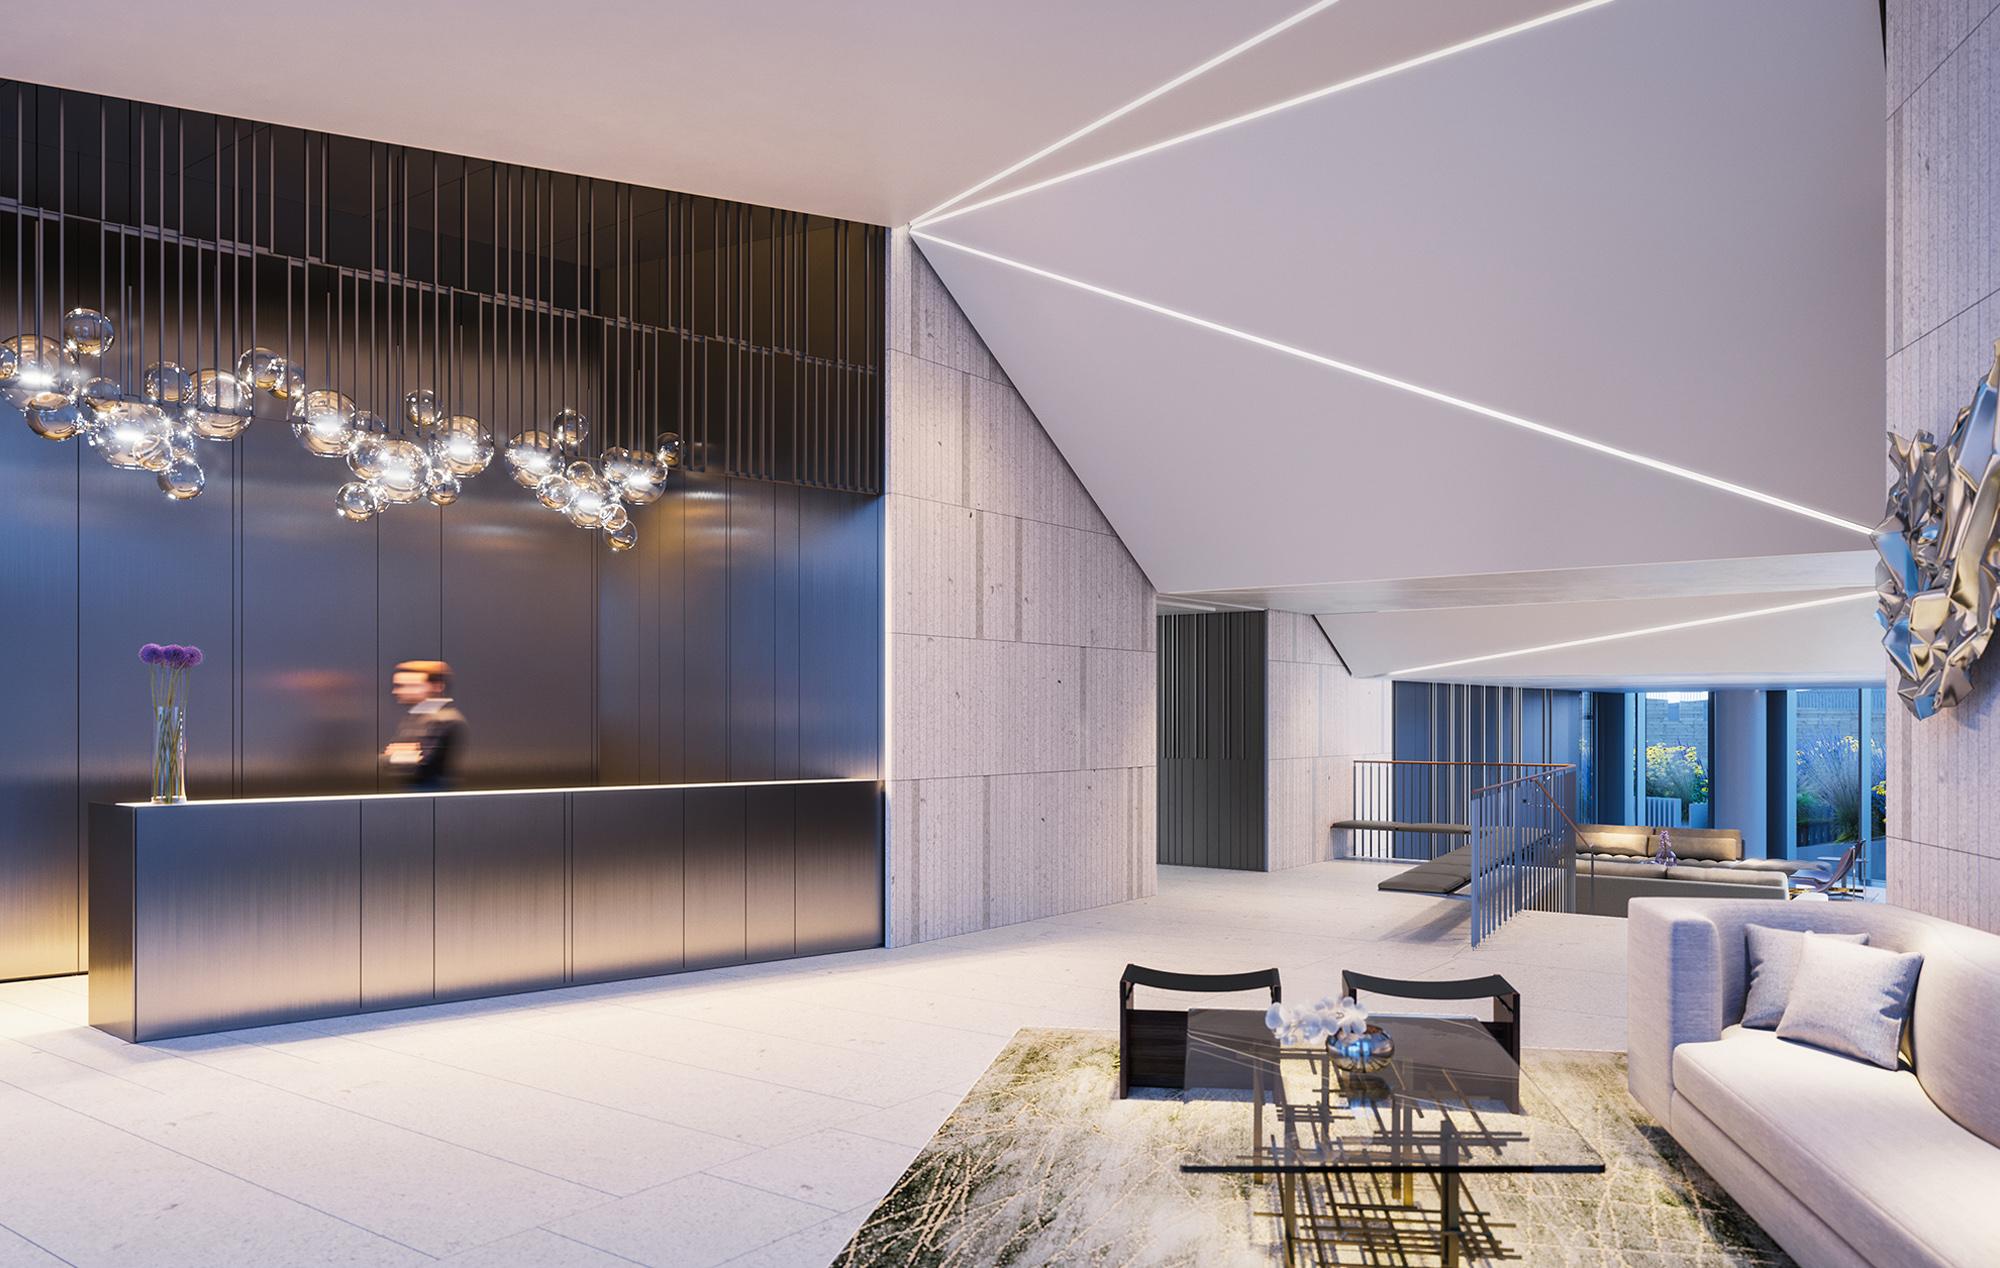 Luxury Condo Lobby Designed as a Geometric Masterpiece